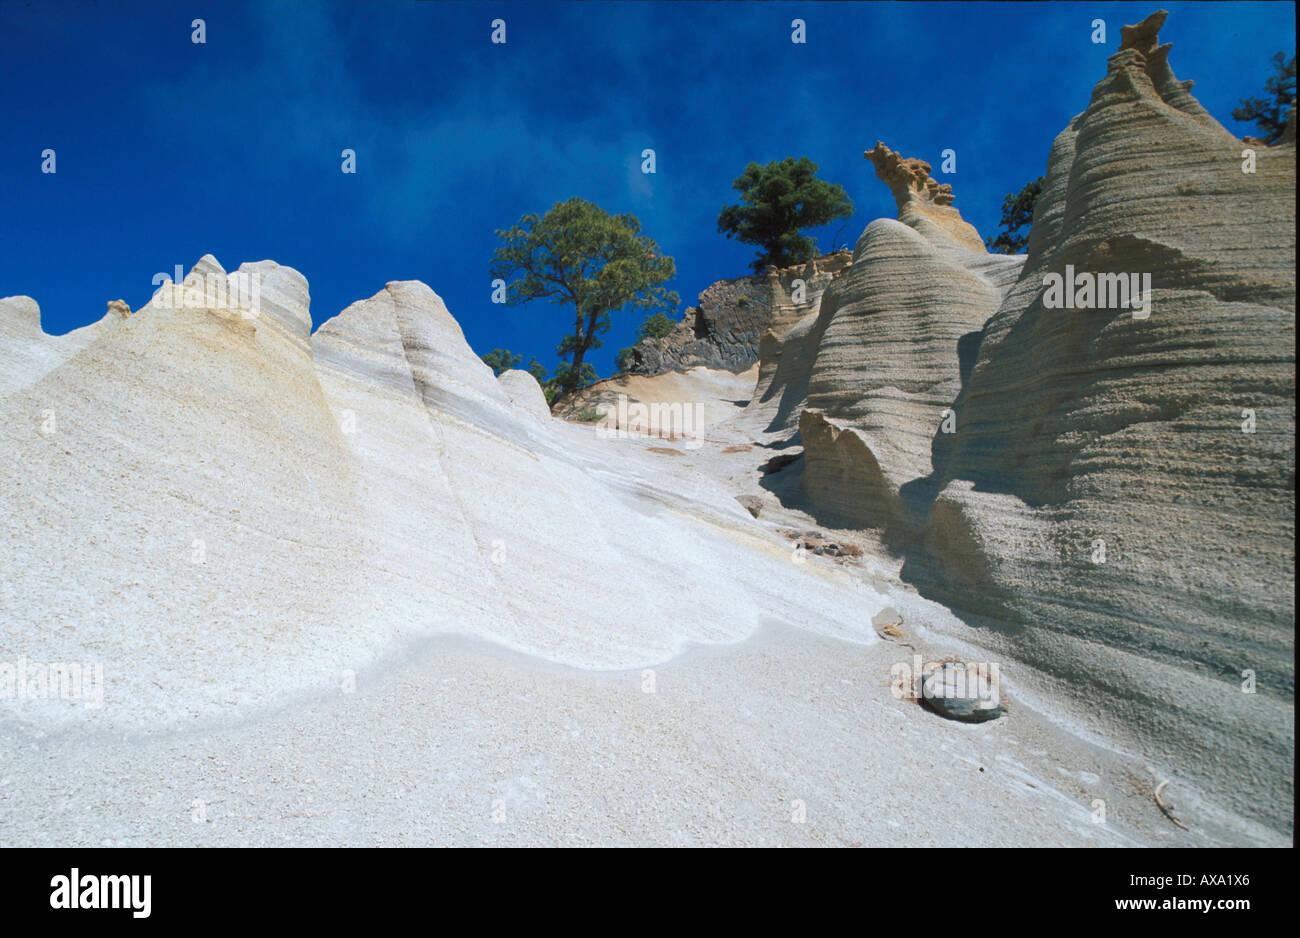 Paisaje Lunar, Mondlandschaft, Vilaflor, Teneriffa Kanarische Inseln, Spanien - Stock Image